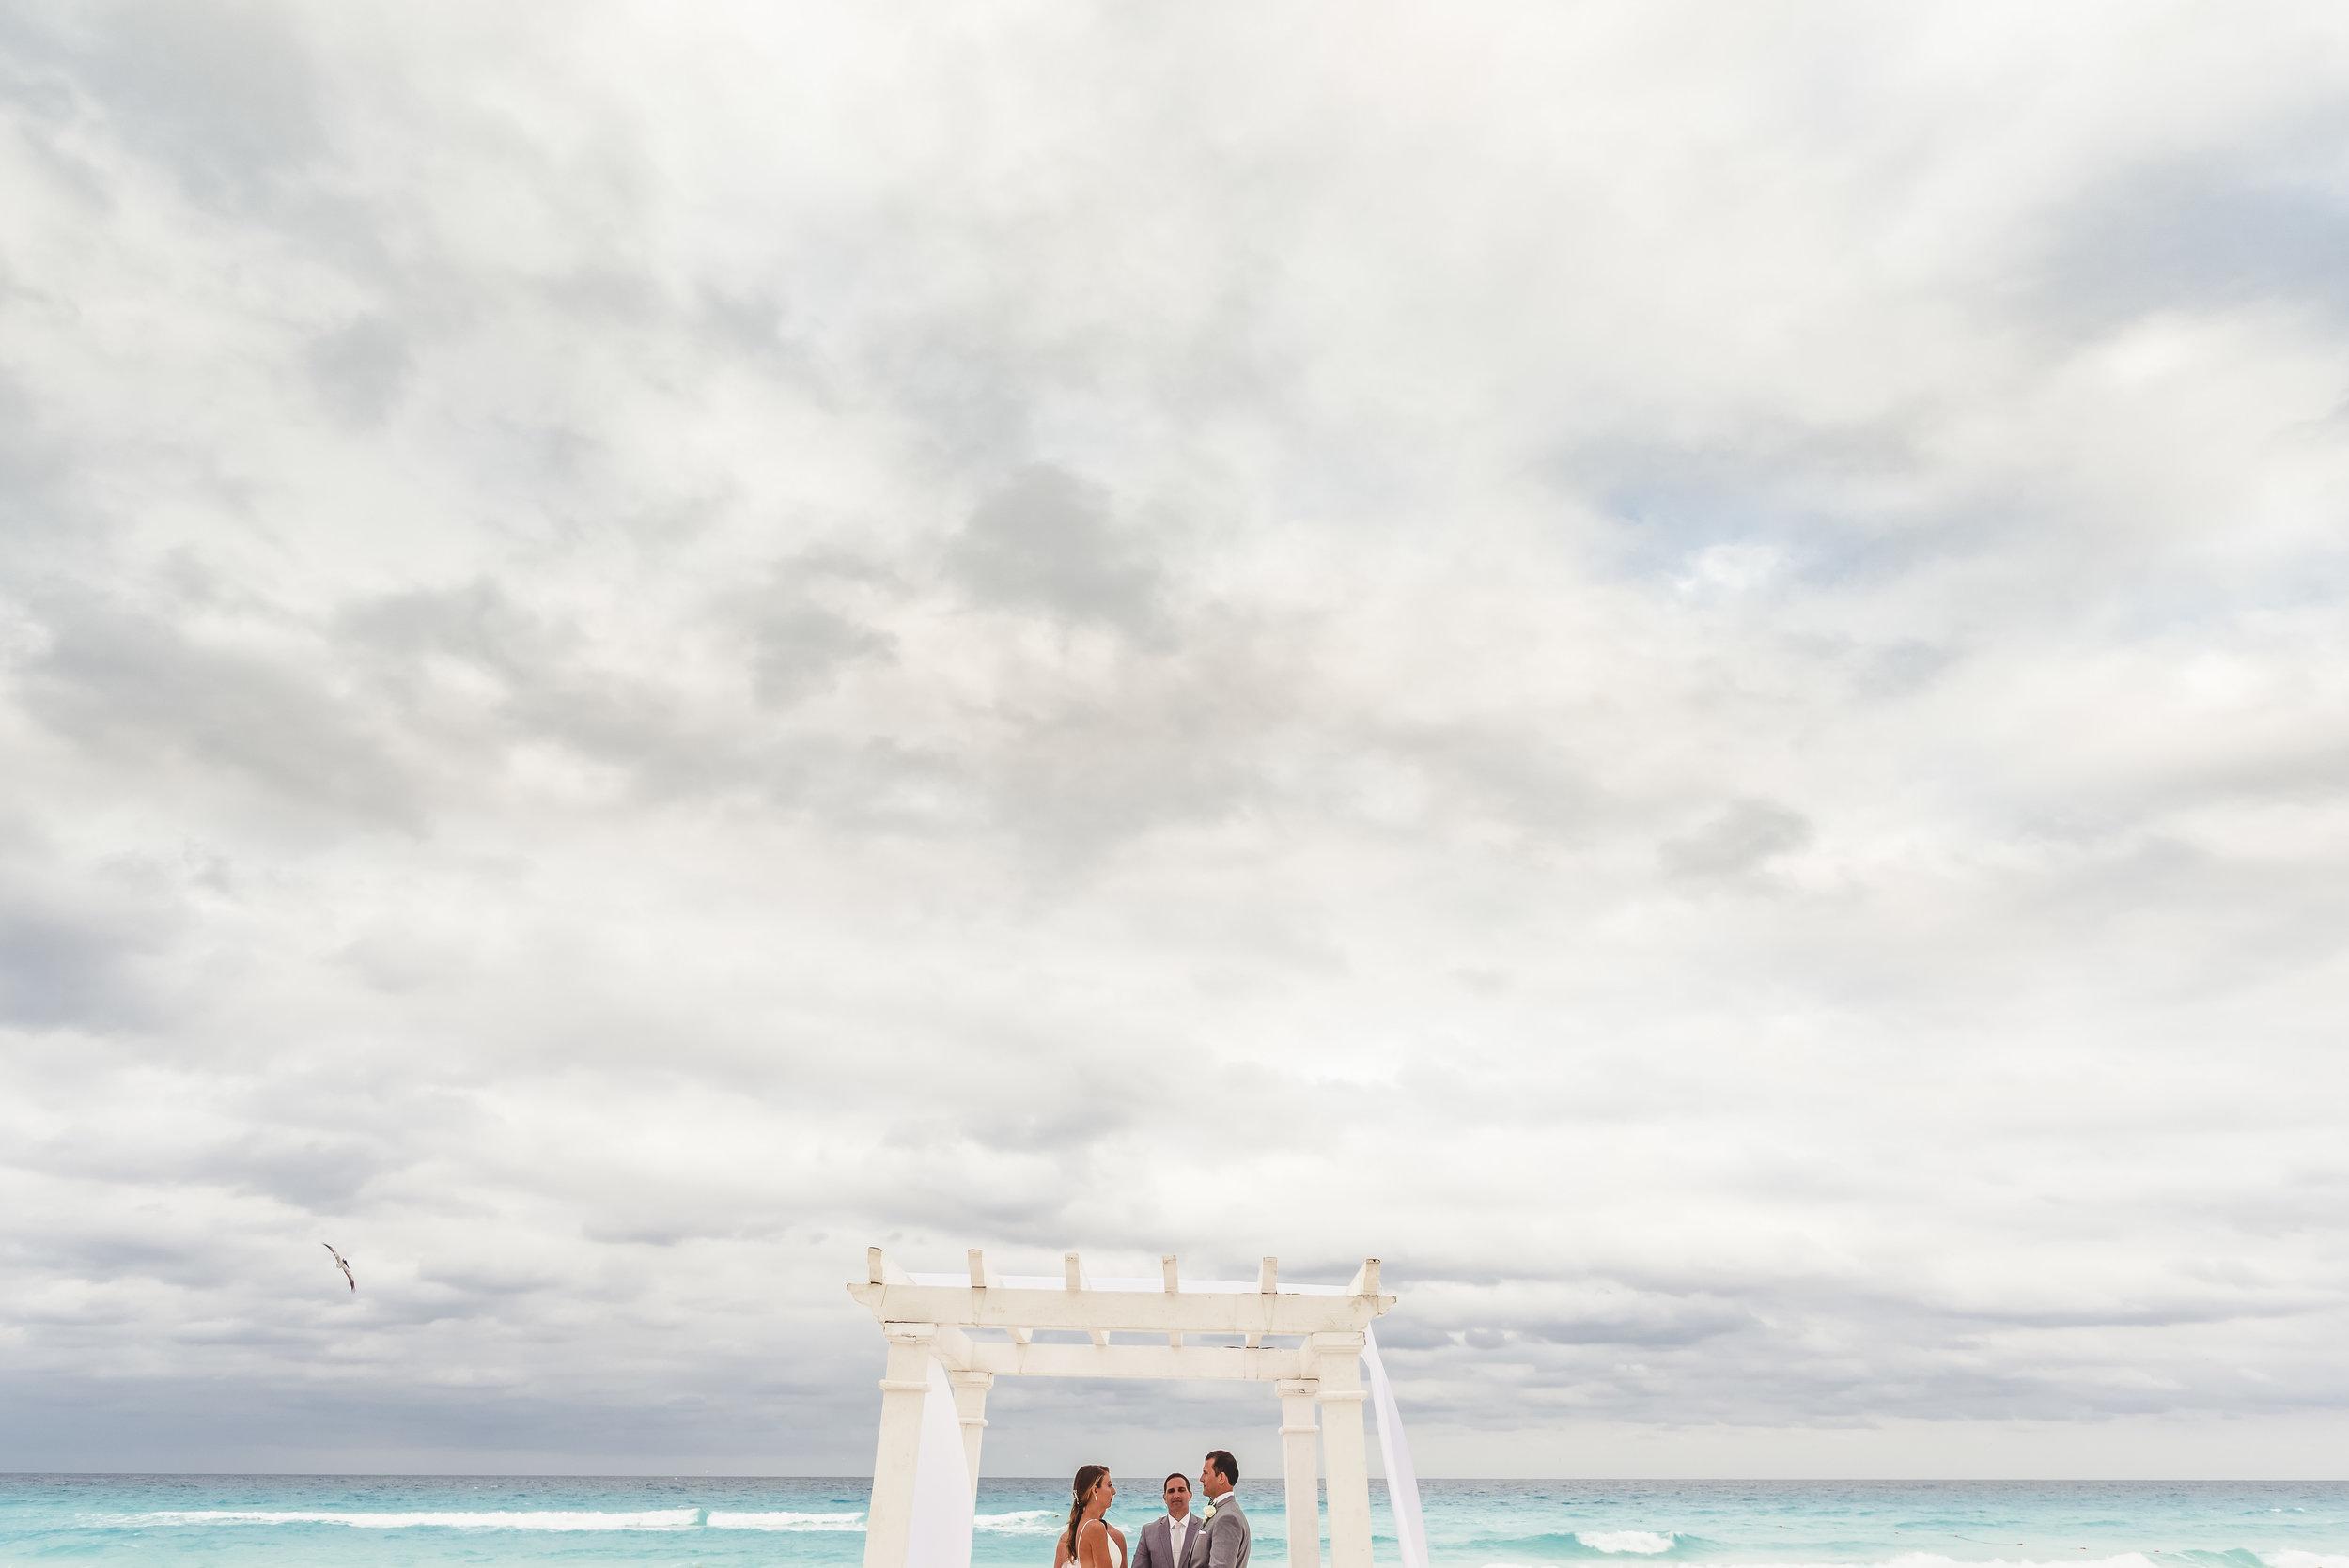 mexico_destination_wedding_ceremony-1.jpg